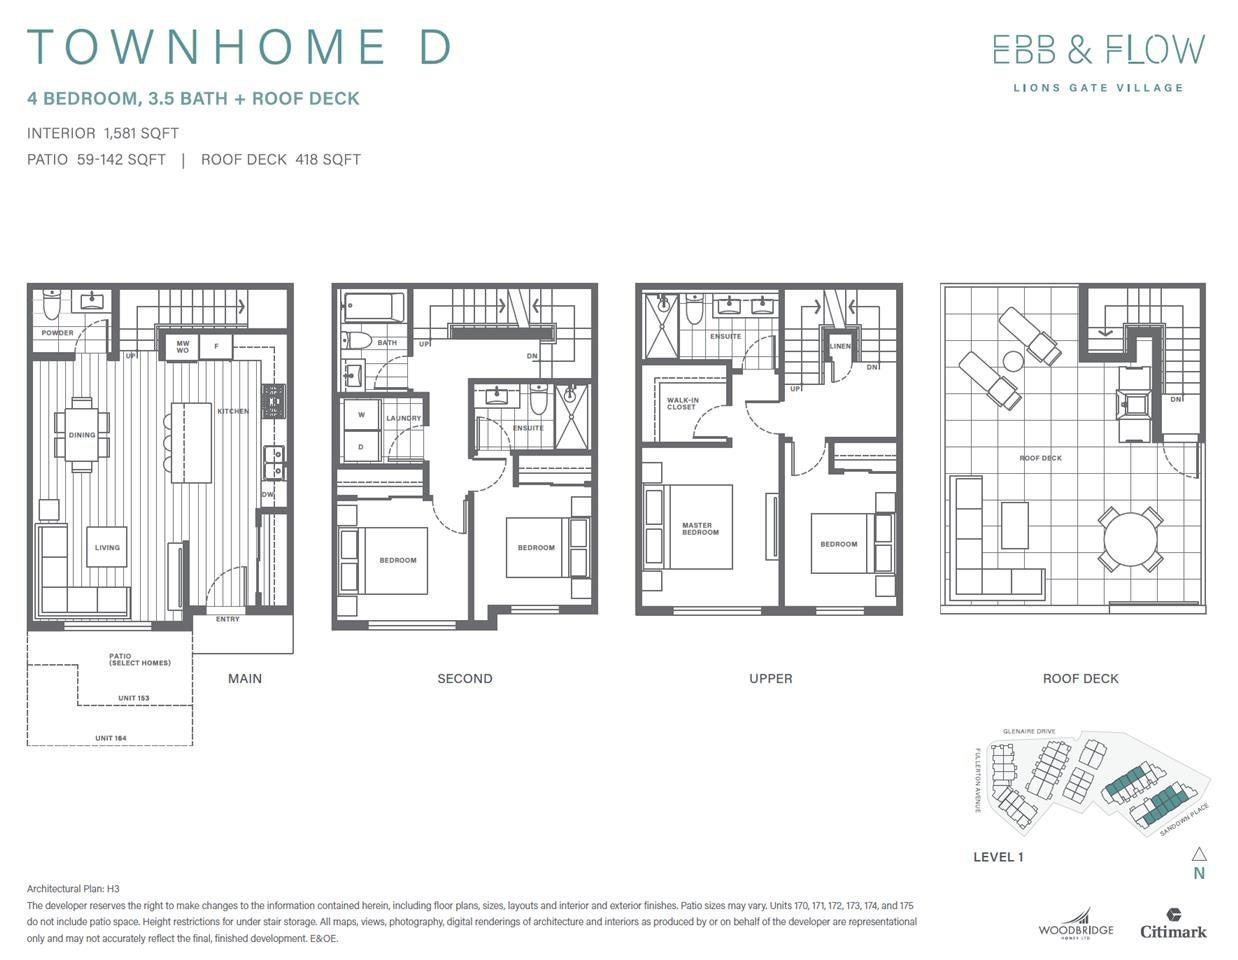 164 2035 GLENAIRE DRIVE - Pemberton NV Townhouse for sale, 4 Bedrooms (R2591437) - #11